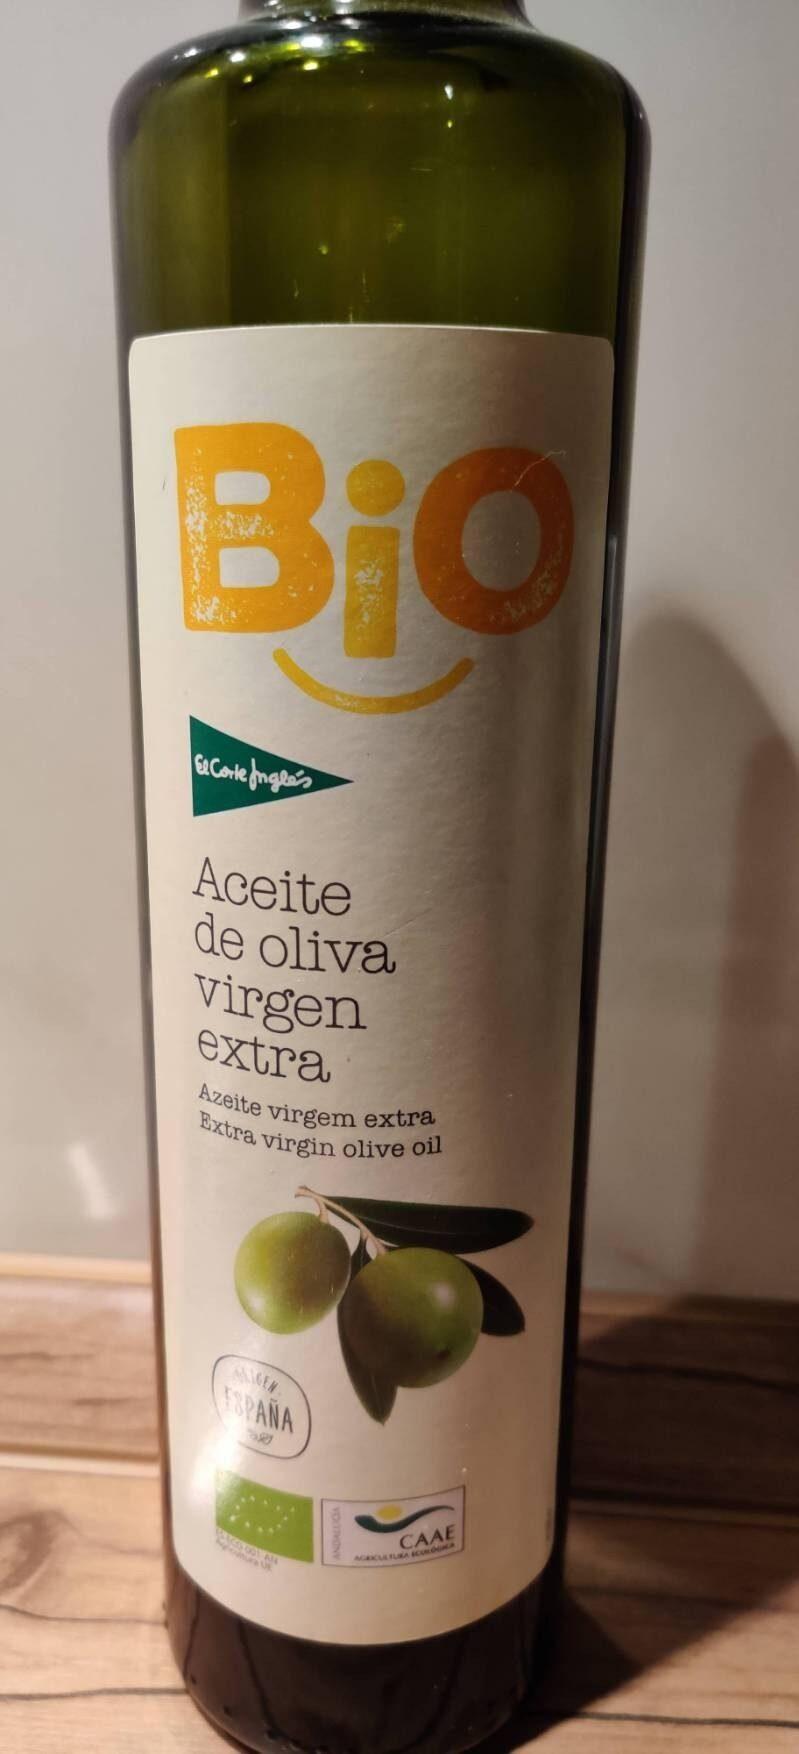 Aceite de oliva virgen extra ecológico botella 500 ml - Producto